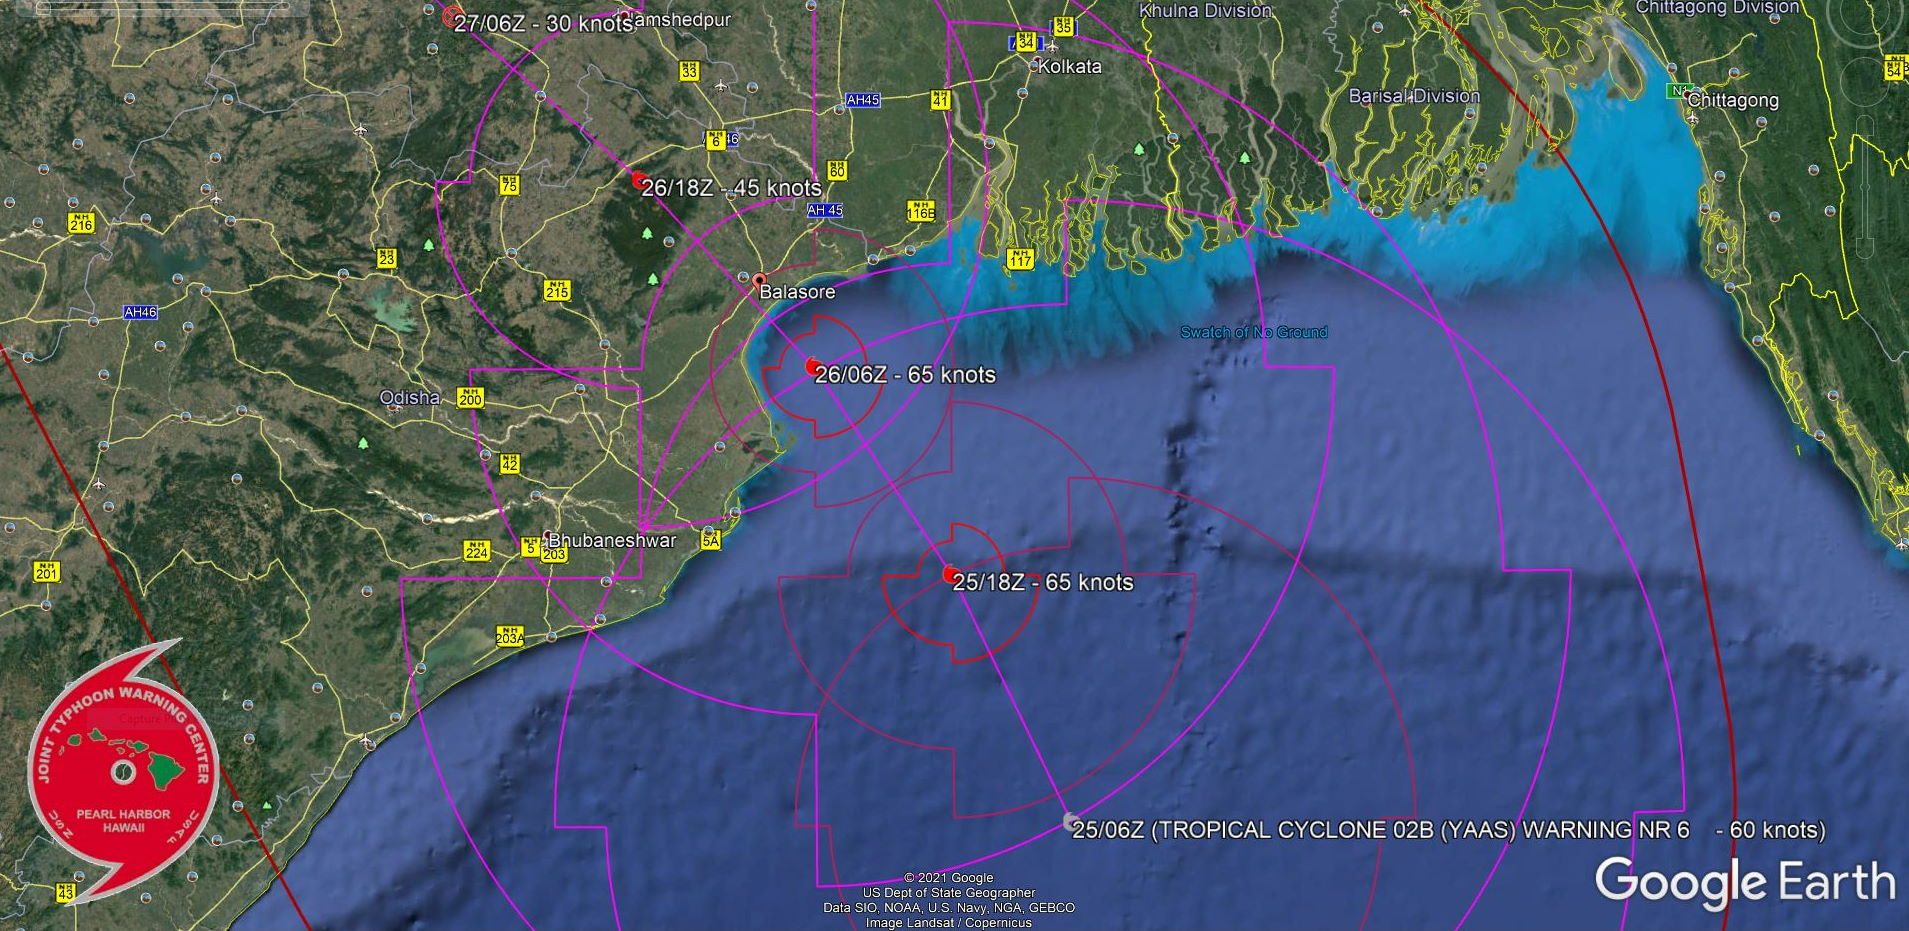 TC 02B. FORECAST LANDFALL AREA: NEAR BALASORE/ODISHA SHORTLY AFTER 24HOURS.